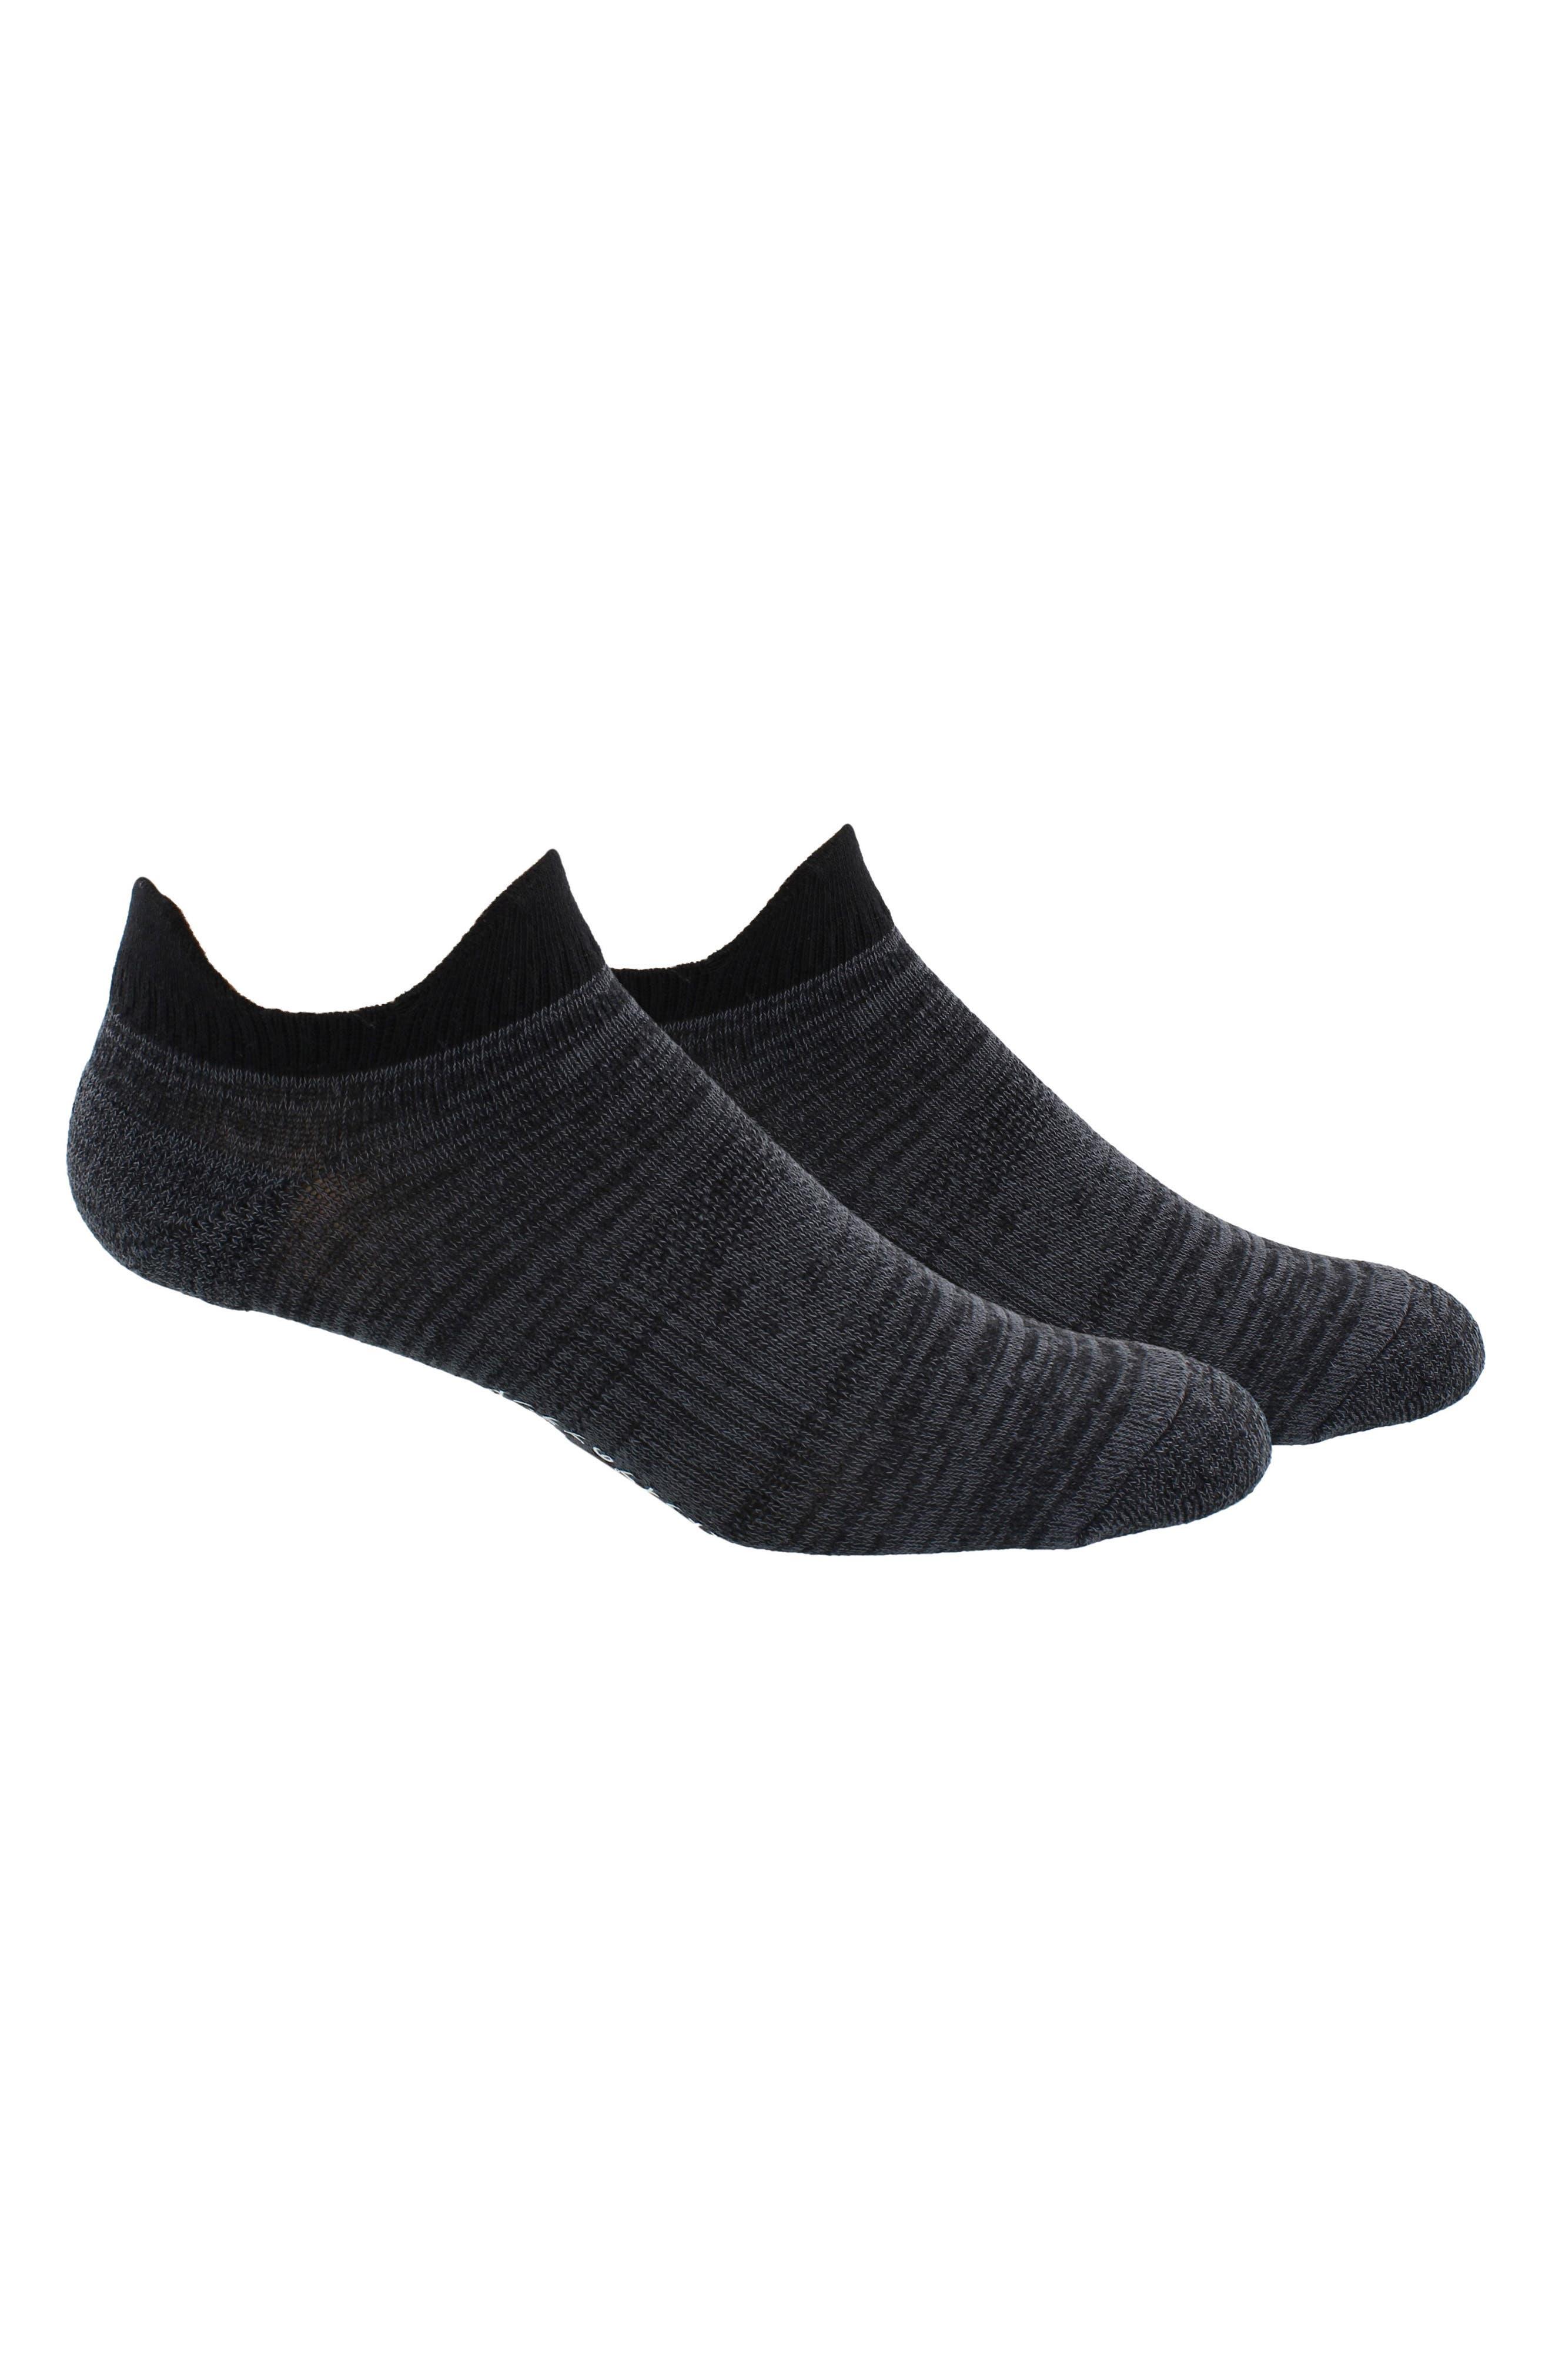 Original NMD Footie Socks,                             Alternate thumbnail 2, color,